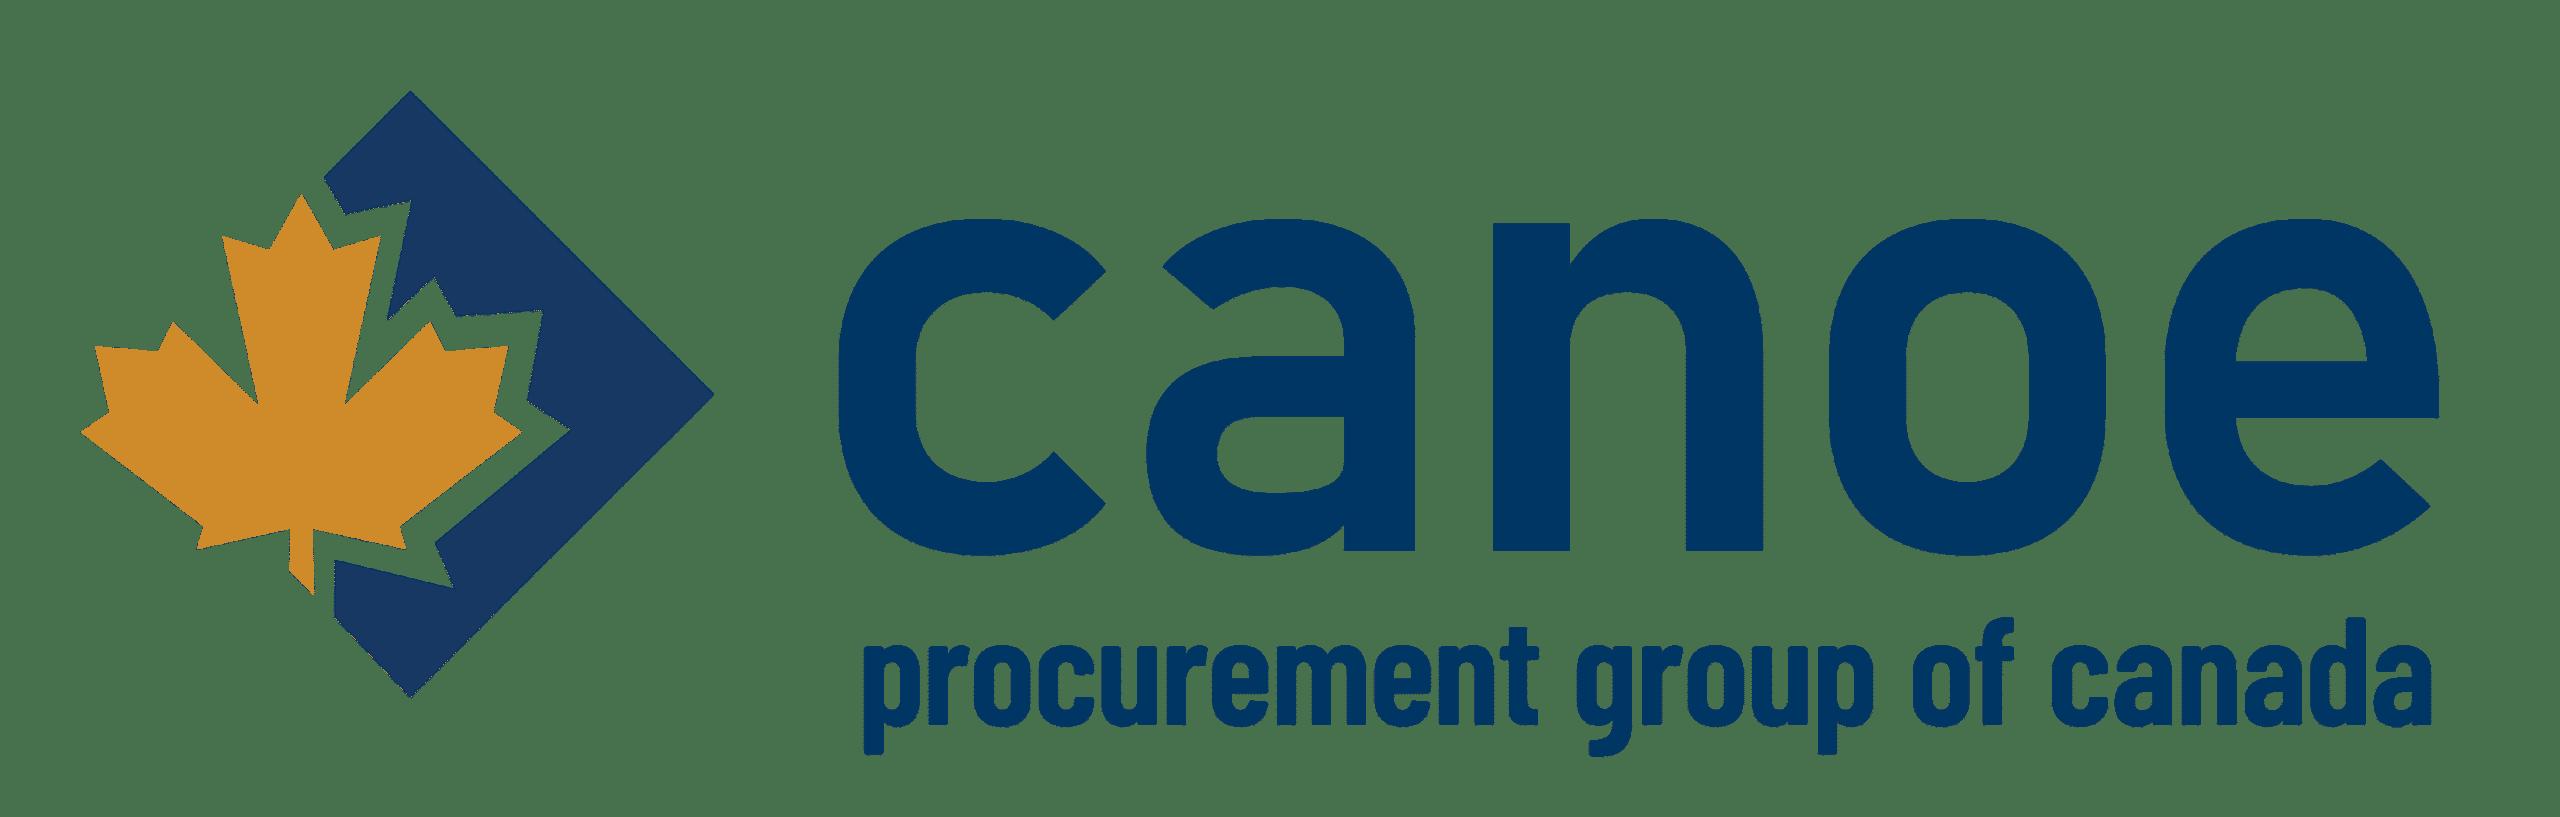 Canoe procurement group of Canada